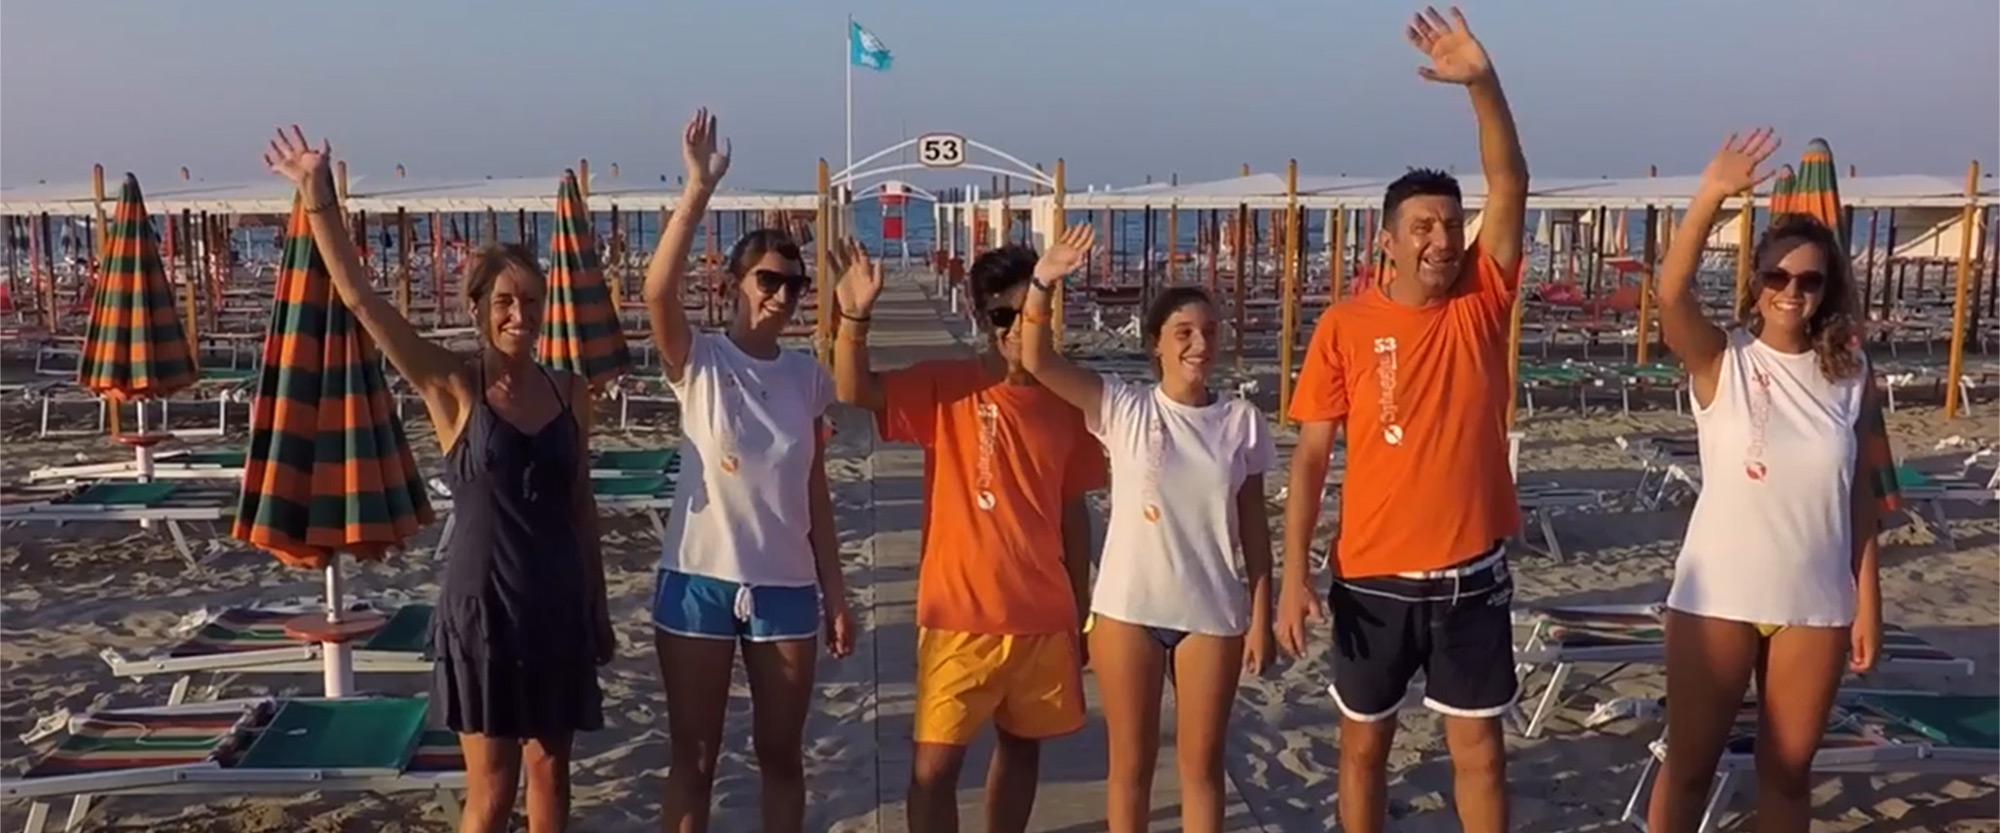 http://www.spiaggia53.it/wp-content/uploads/2017/02/slider-famiglia.jpg